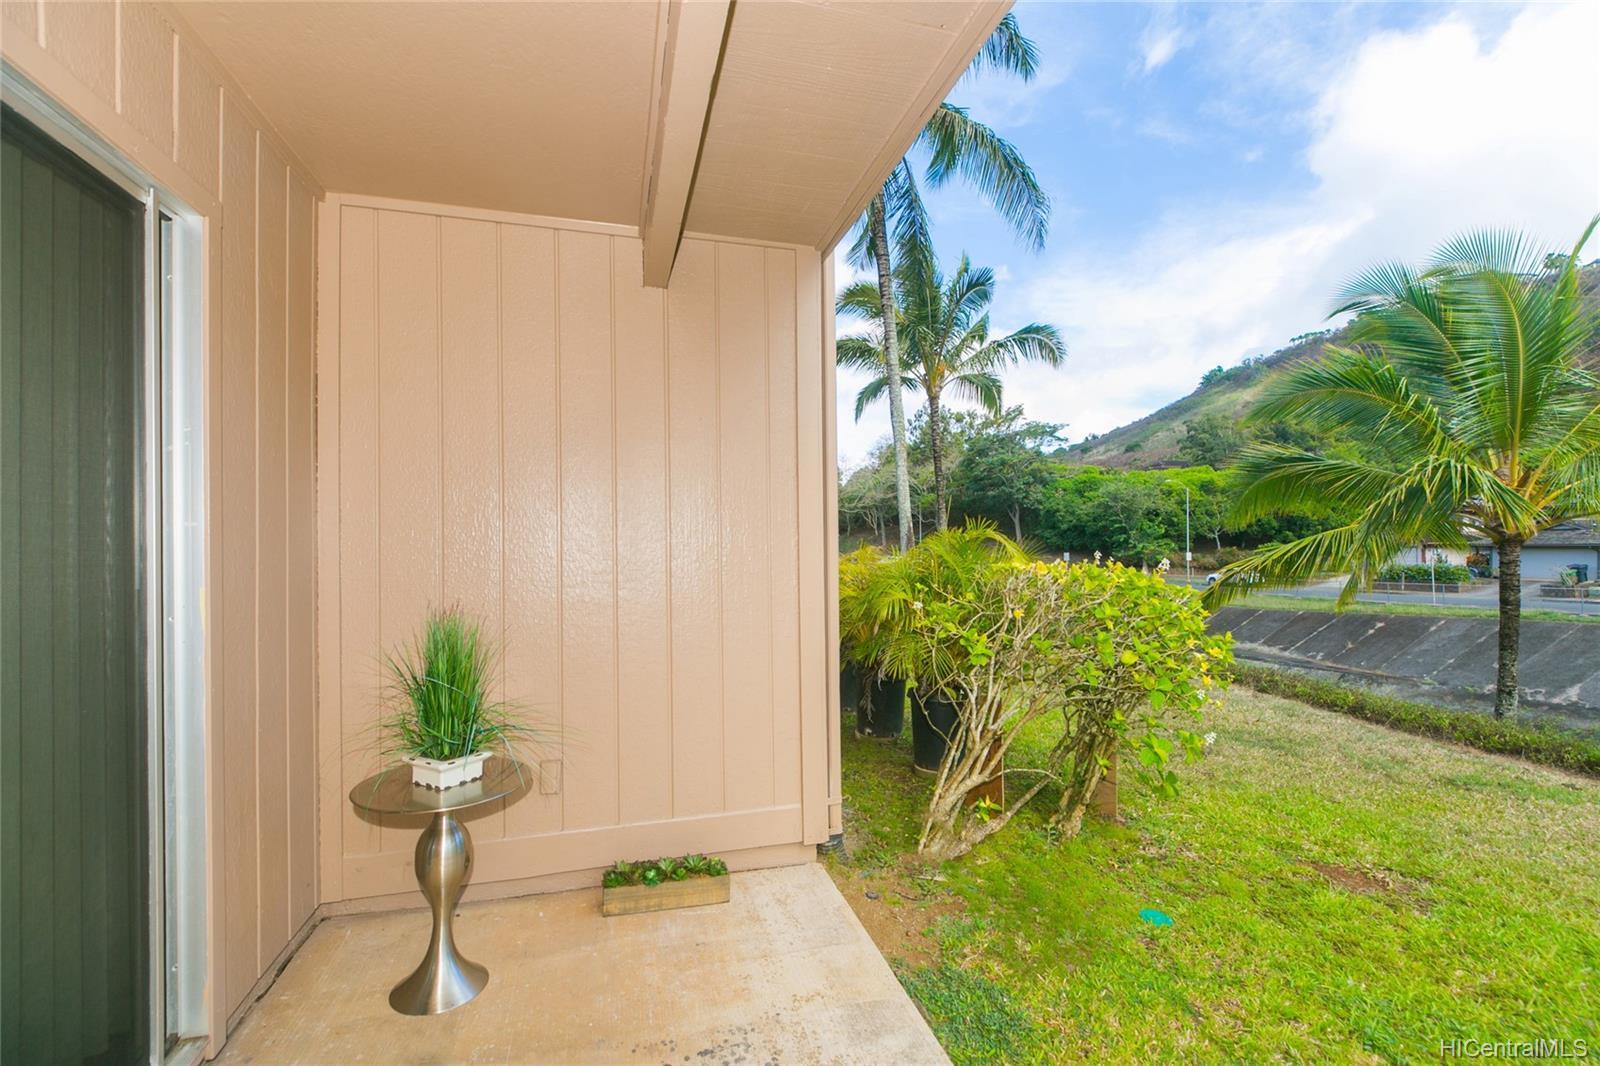 98-625 Kilinoe Street townhouse # 3B1, Aiea, Hawaii - photo 16 of 25